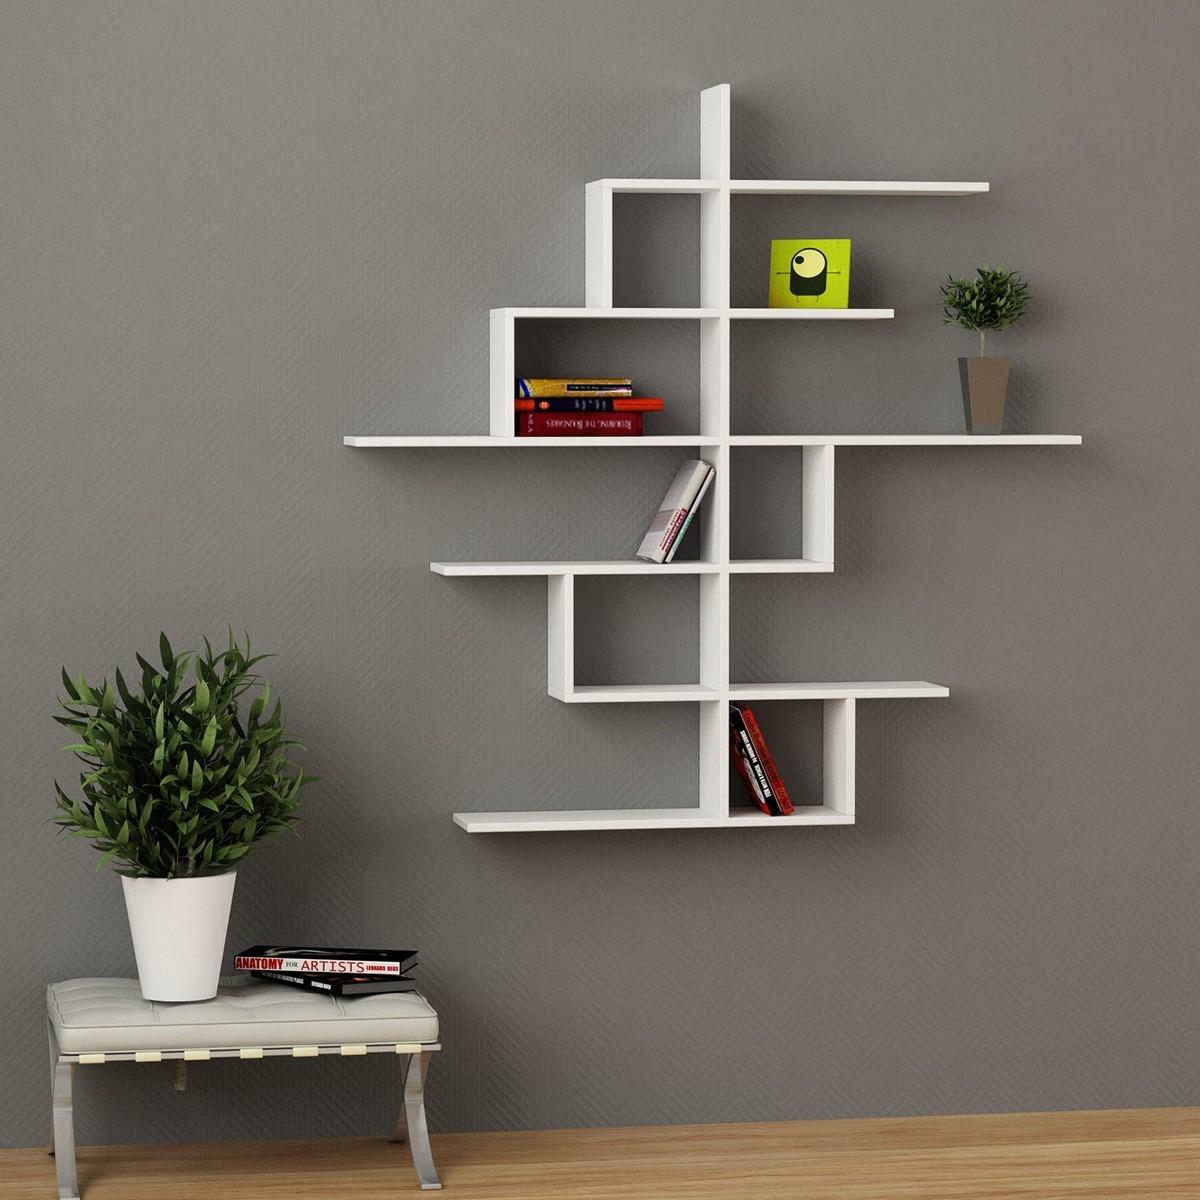 Librerie A Muro. Finest Libreria Da Muro Parete Design Moderna In ...